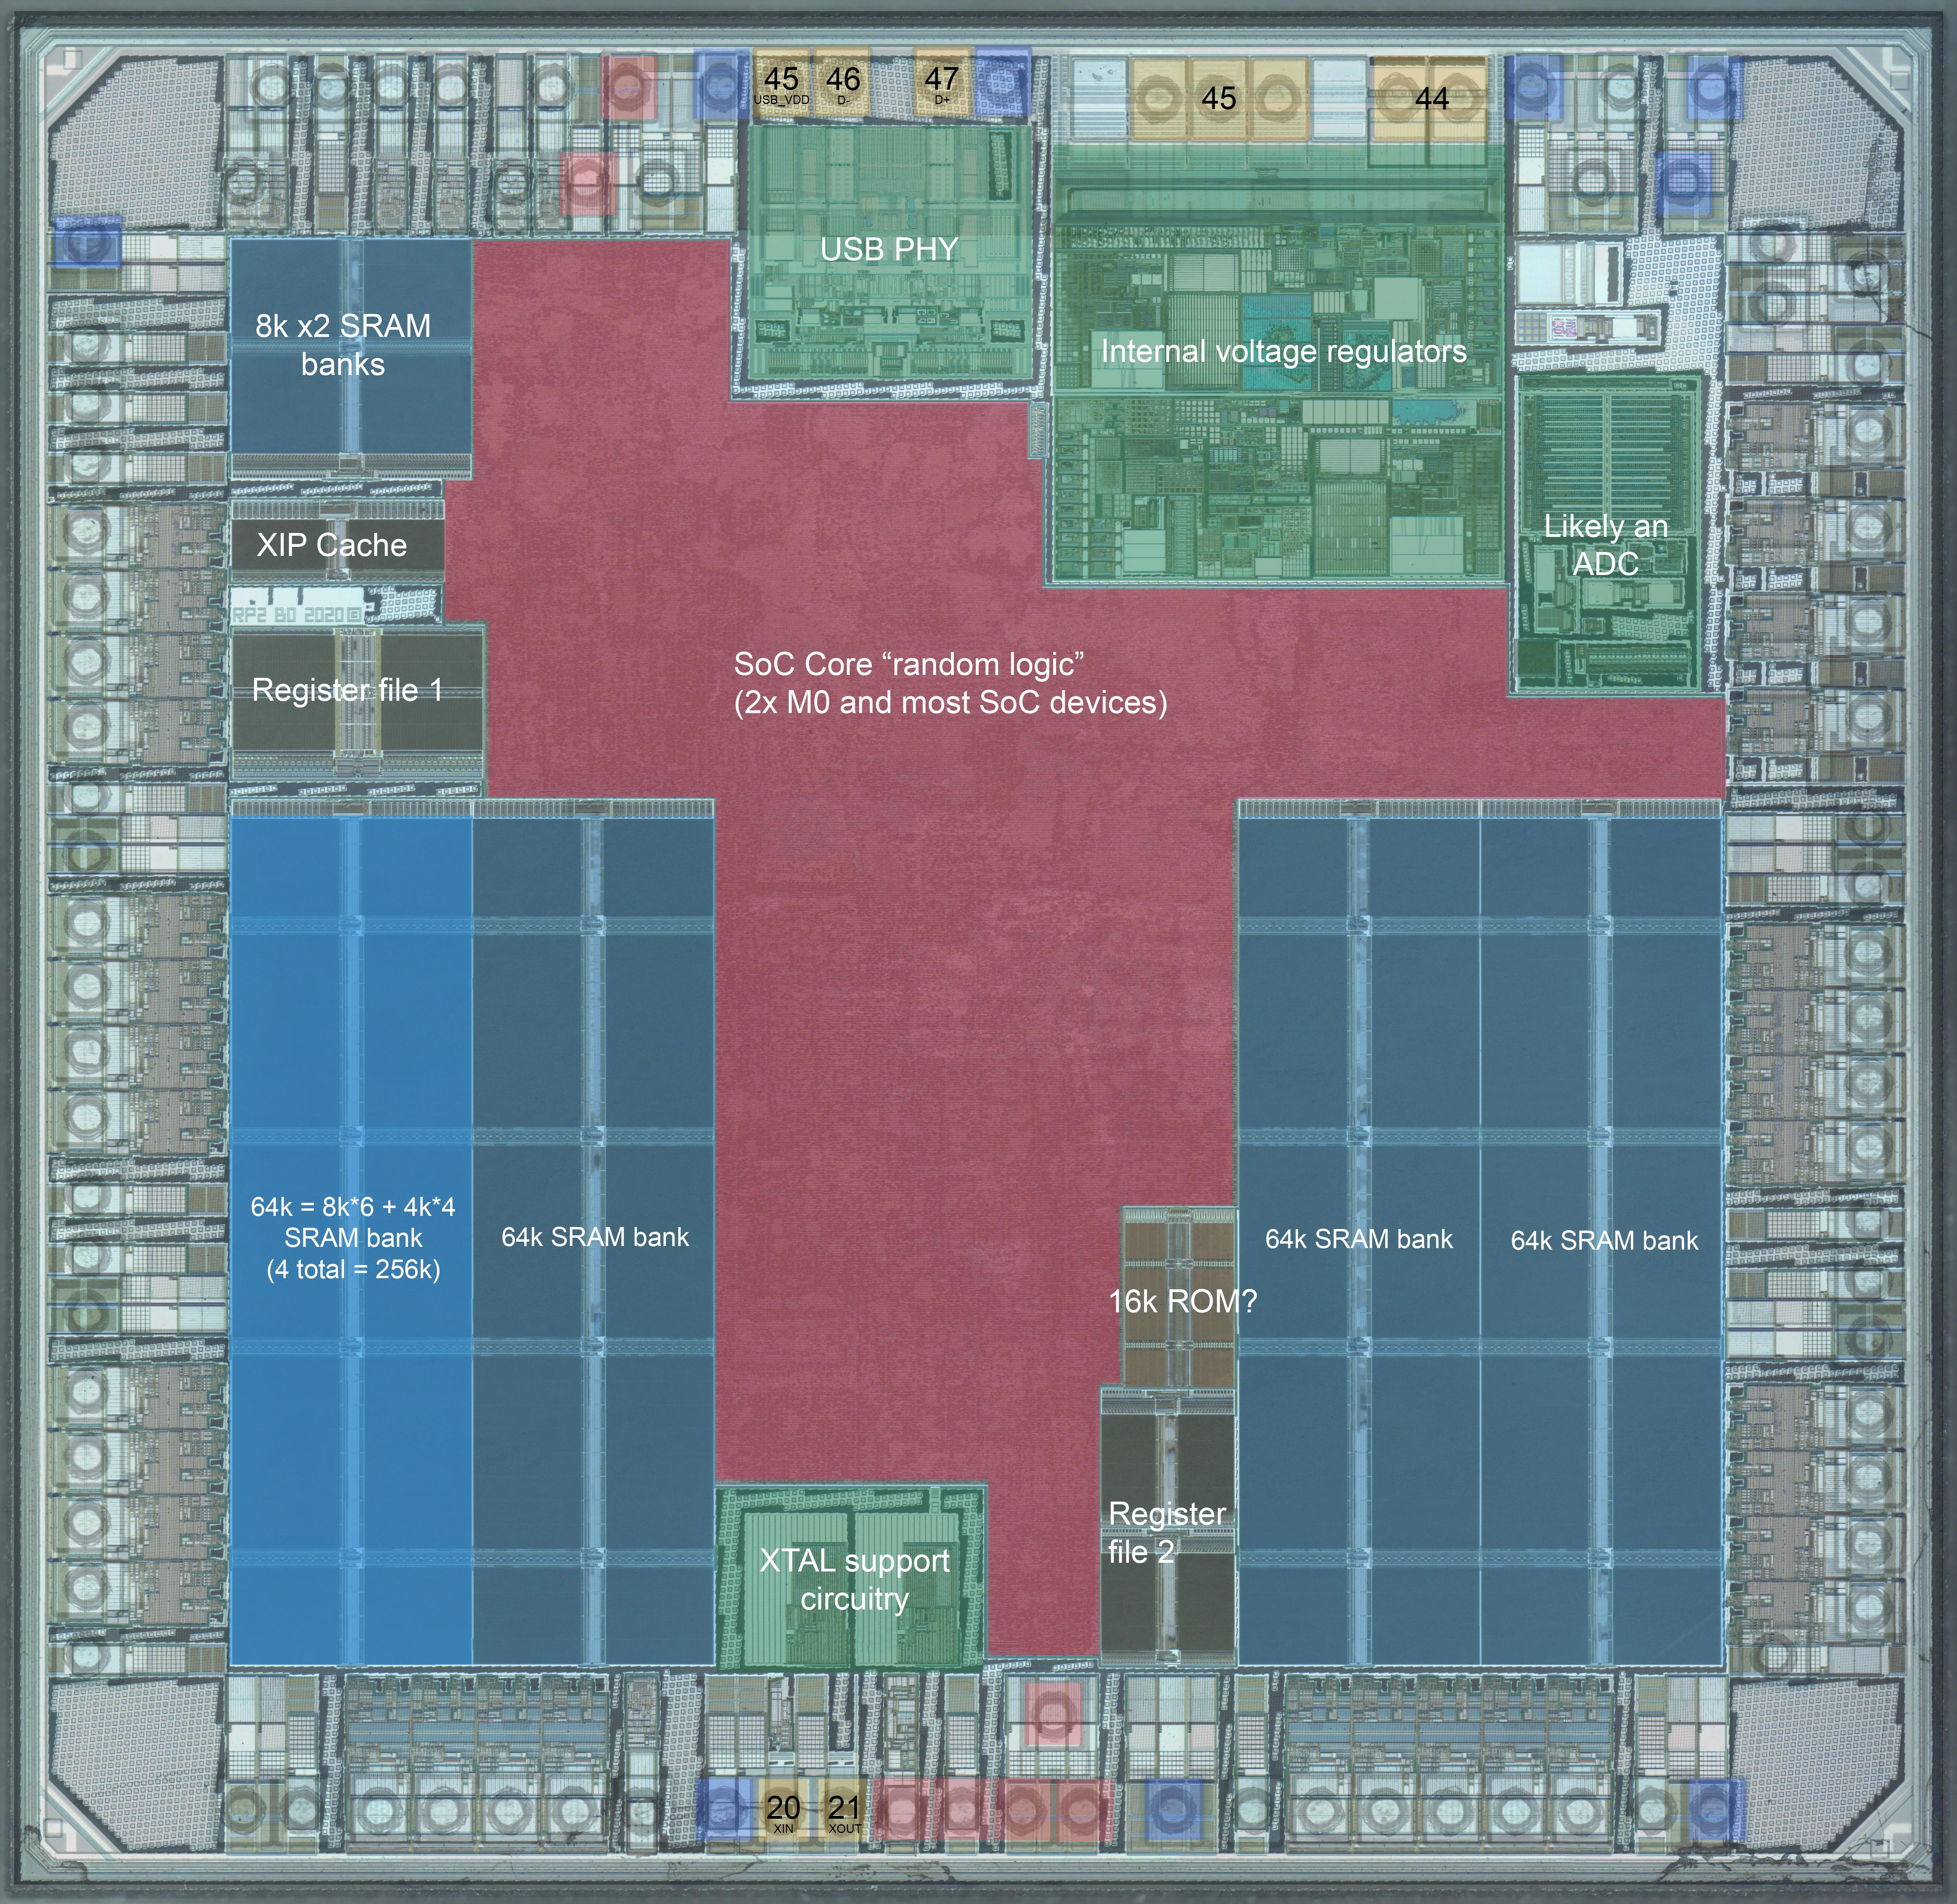 https://cloud-l8bjoq434-hack-club-bot.vercel.app/0rp2040_floorplan.jpg